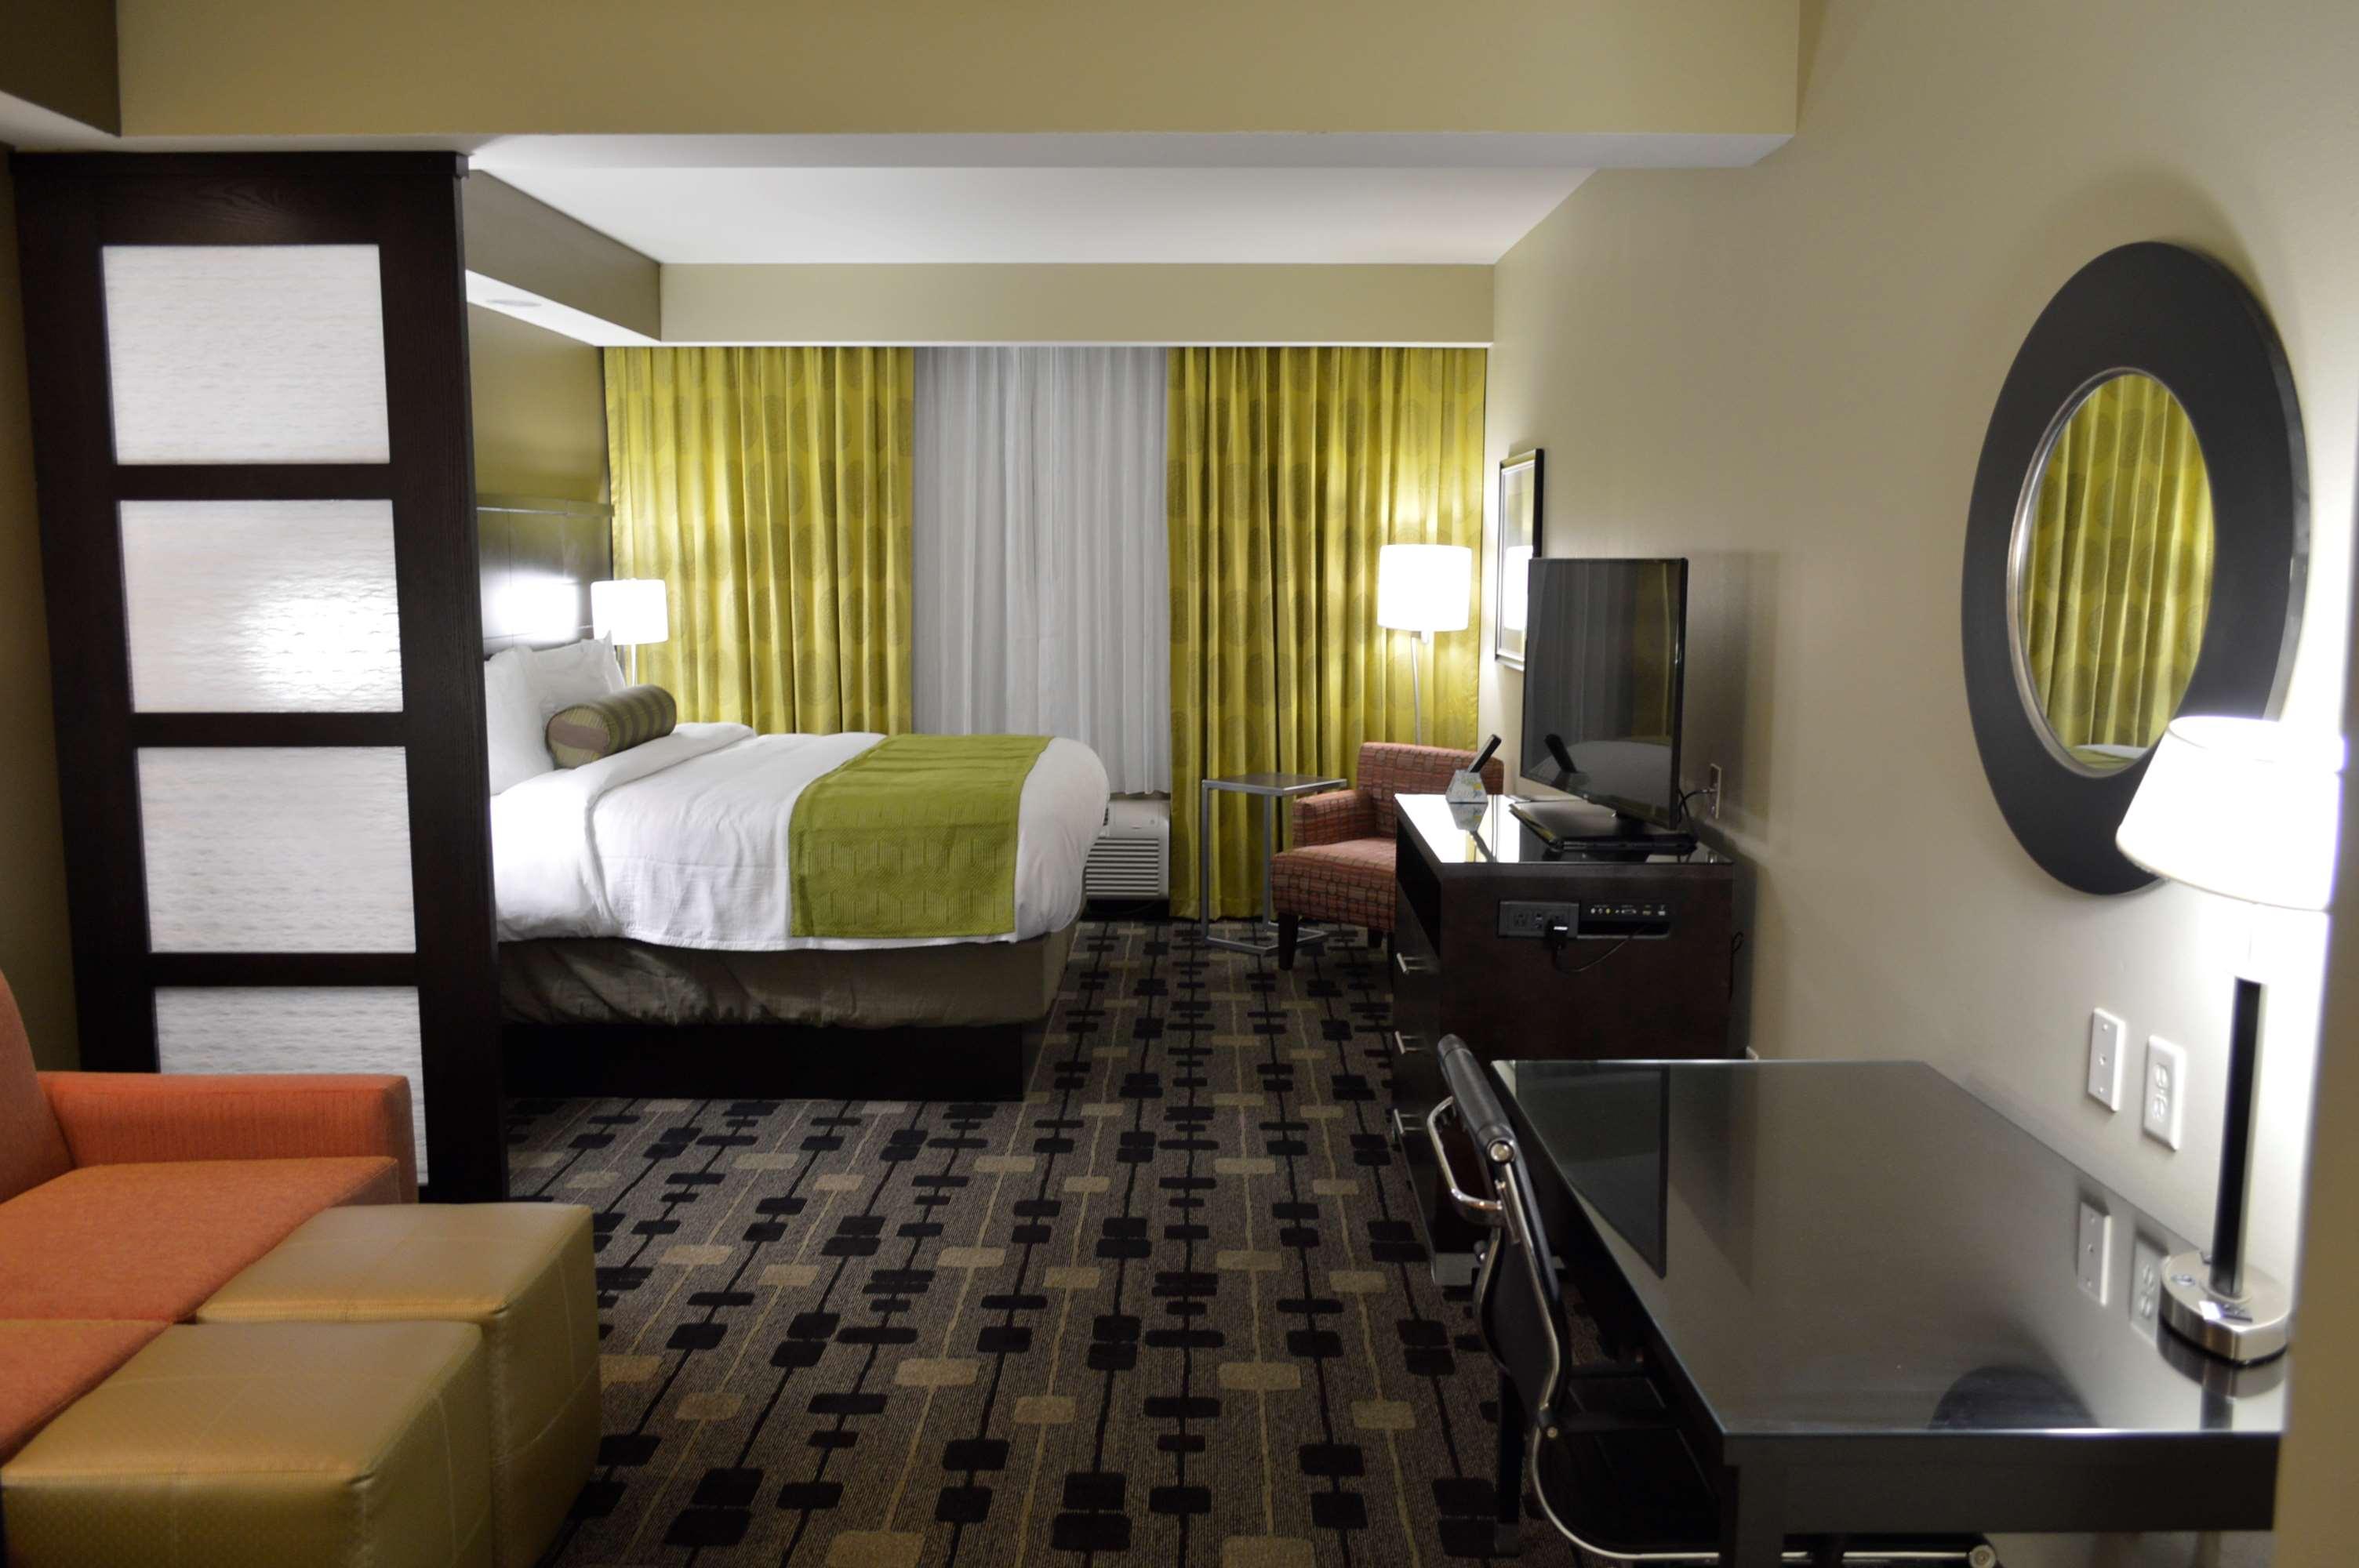 Best Western Premier University Inn 132 Plaza Drive Hattiesburg, MS Hotels  U0026 Motels   MapQuest